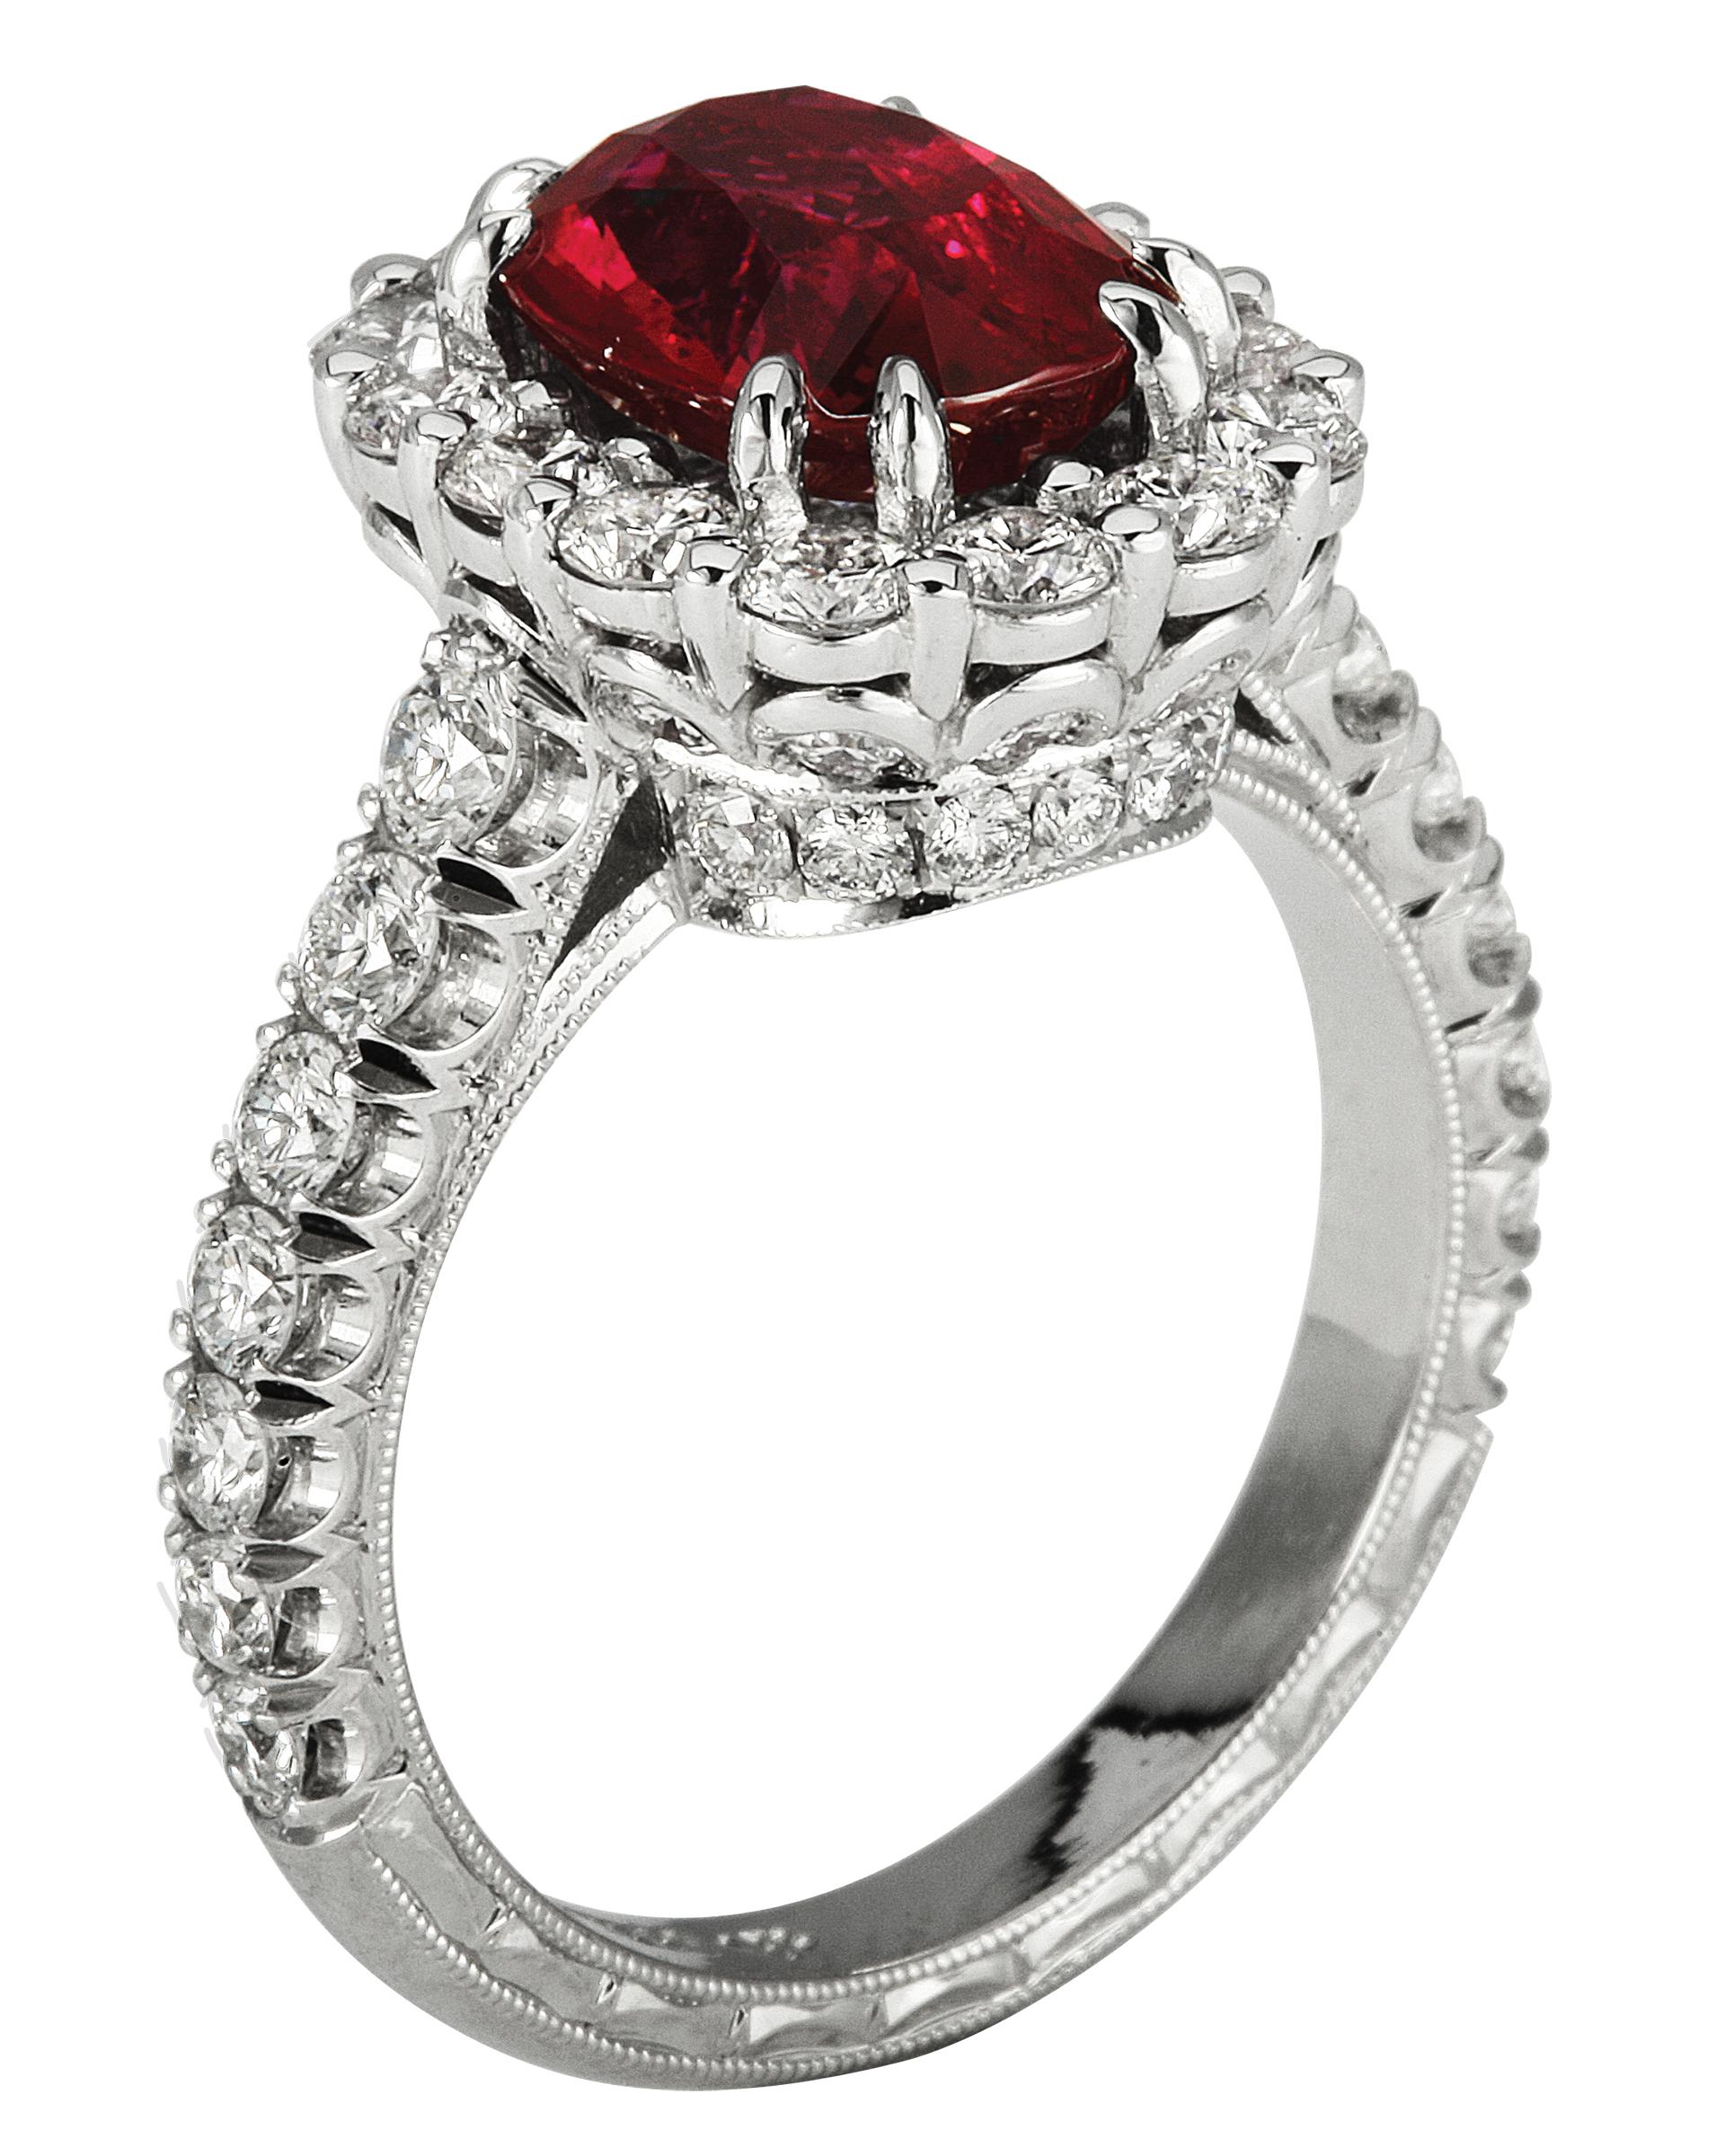 jack-kelege-ruby-engagement-ring-diamond-halo-and-shank-0816.jpg